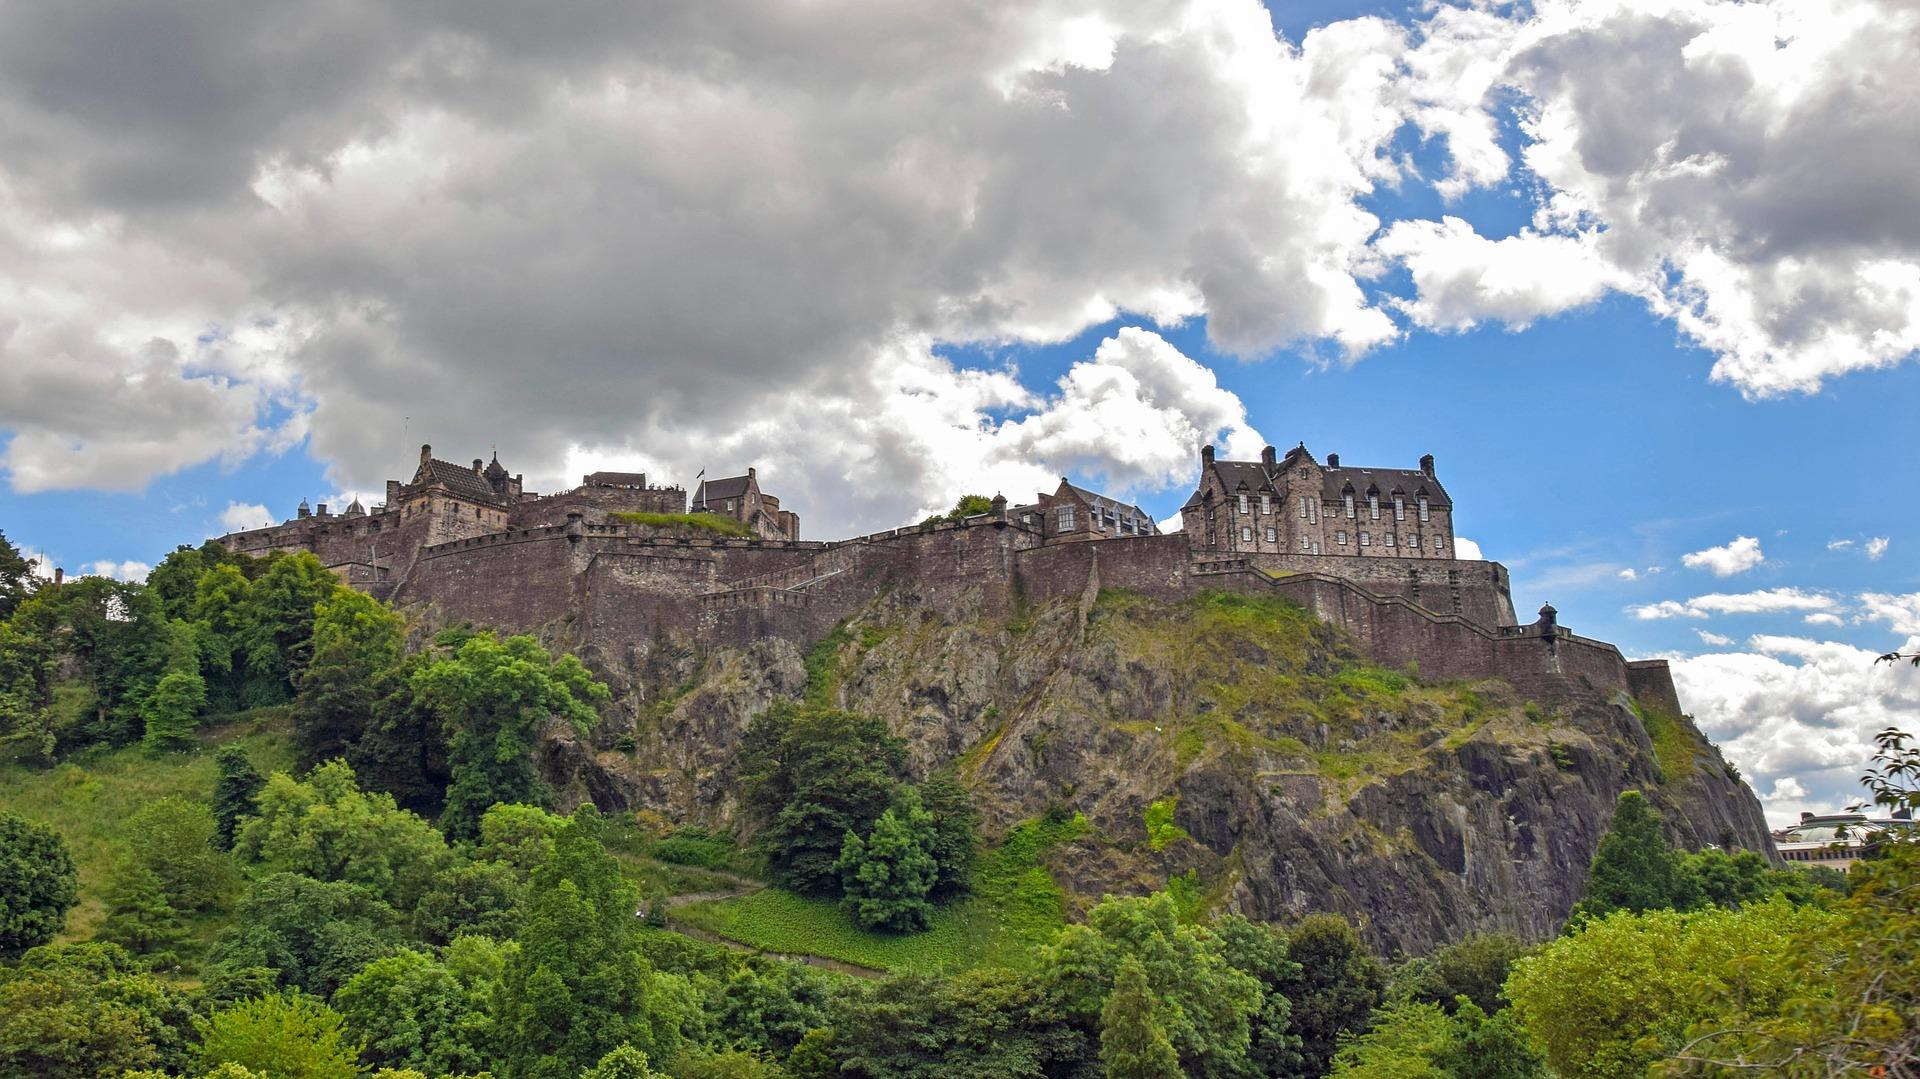 Tour del Castillo de Edimburgo